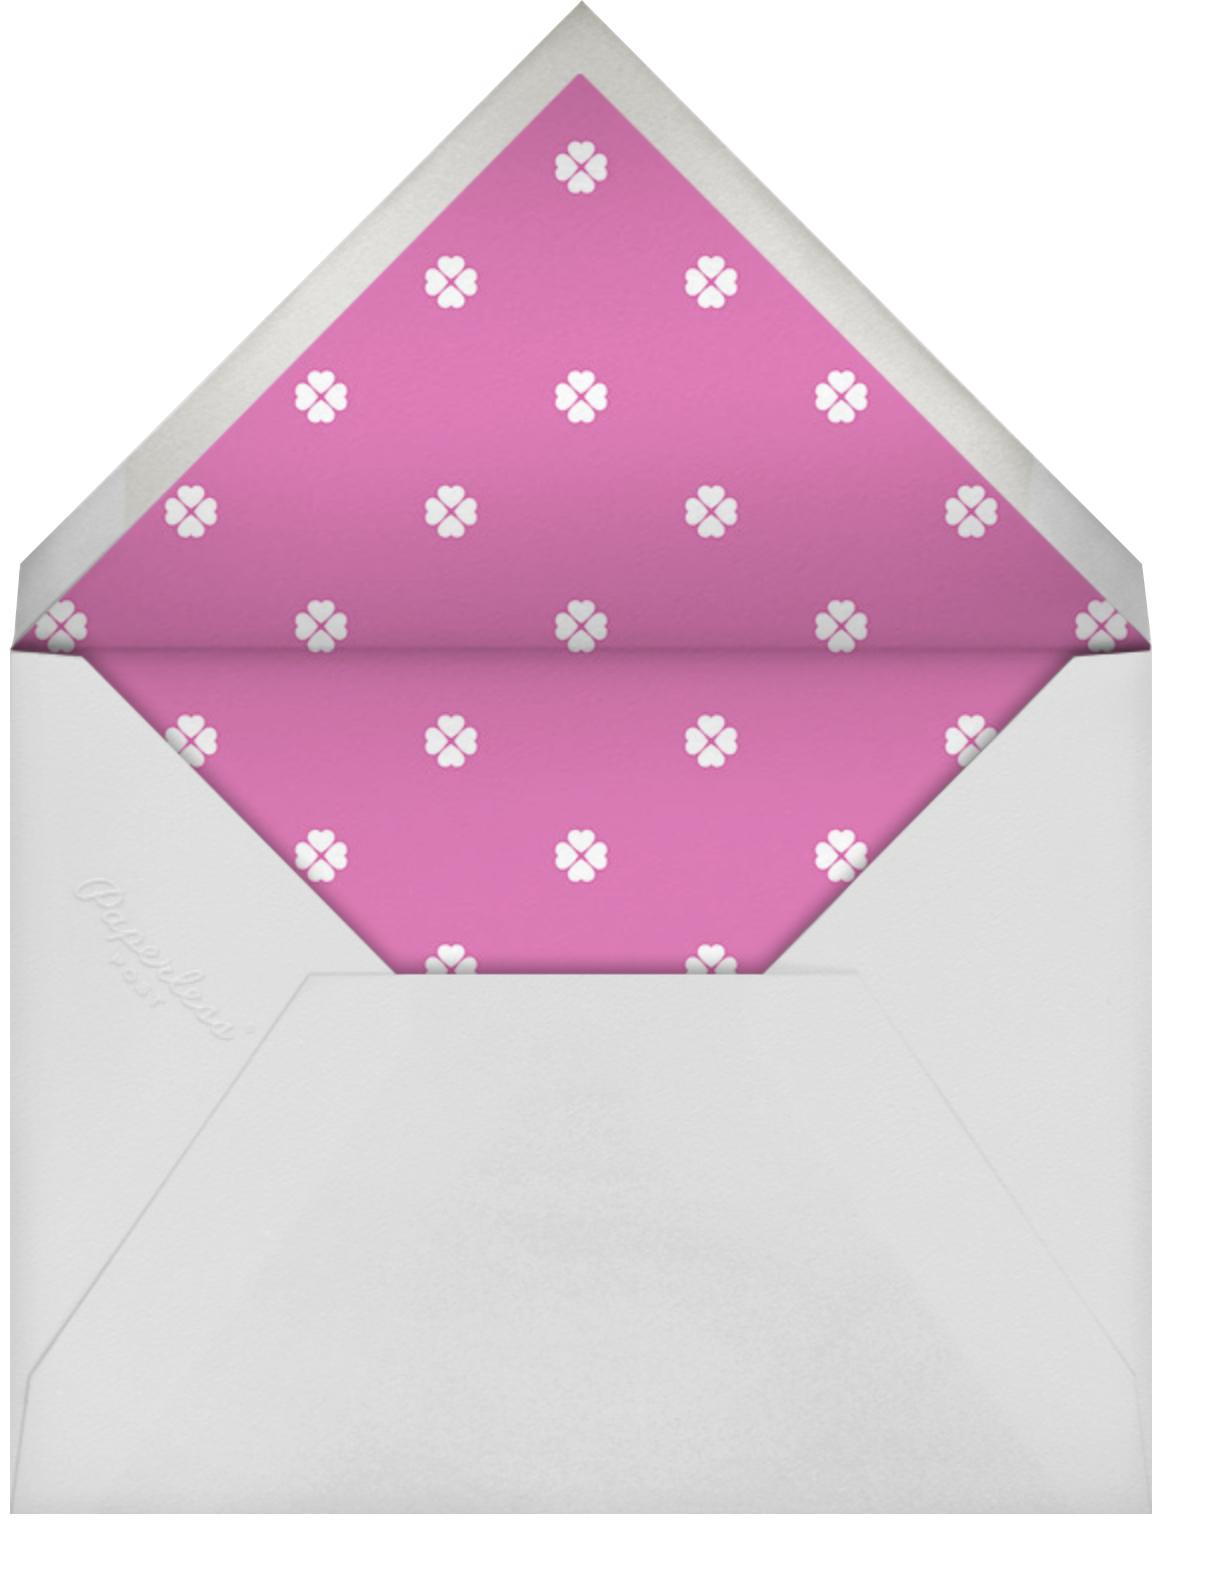 Colorblocked Stripes - Carnation/Heath - kate spade new york - Adult birthday - envelope back